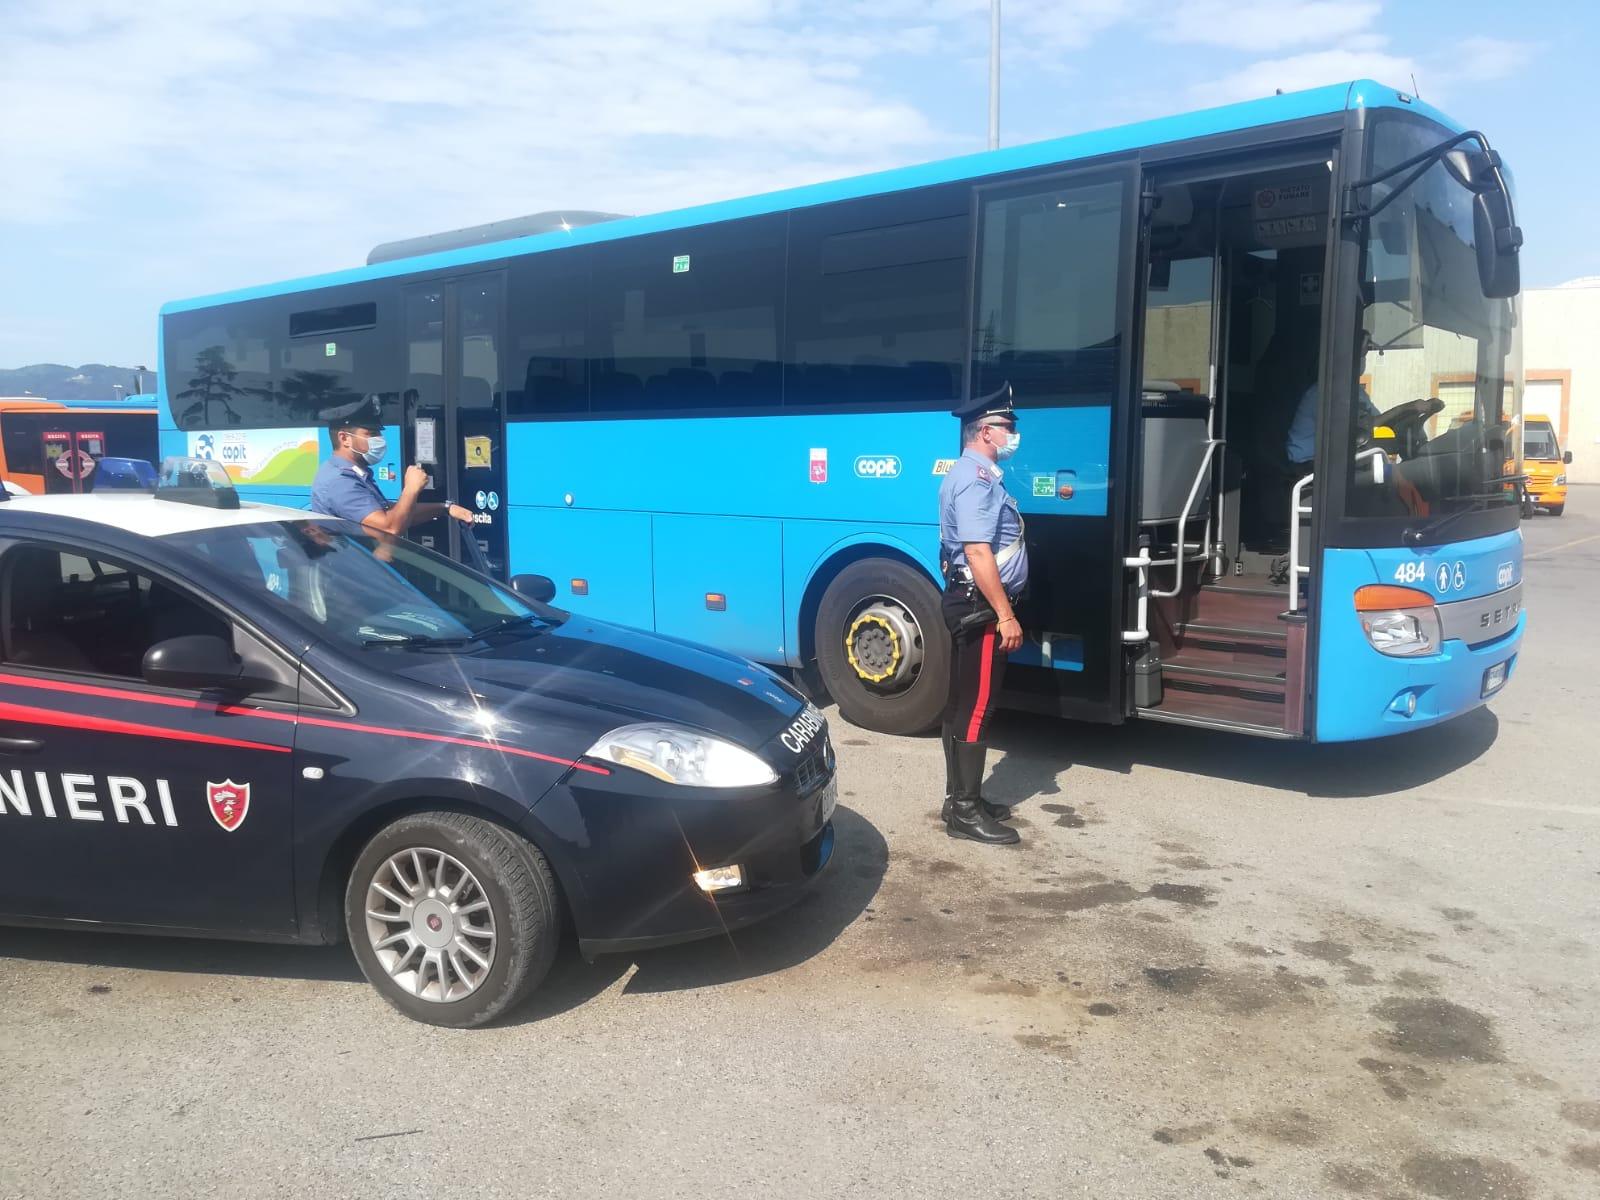 Cronaca, Carabinieri: un arresto per resistenza a pubblico ufficiale